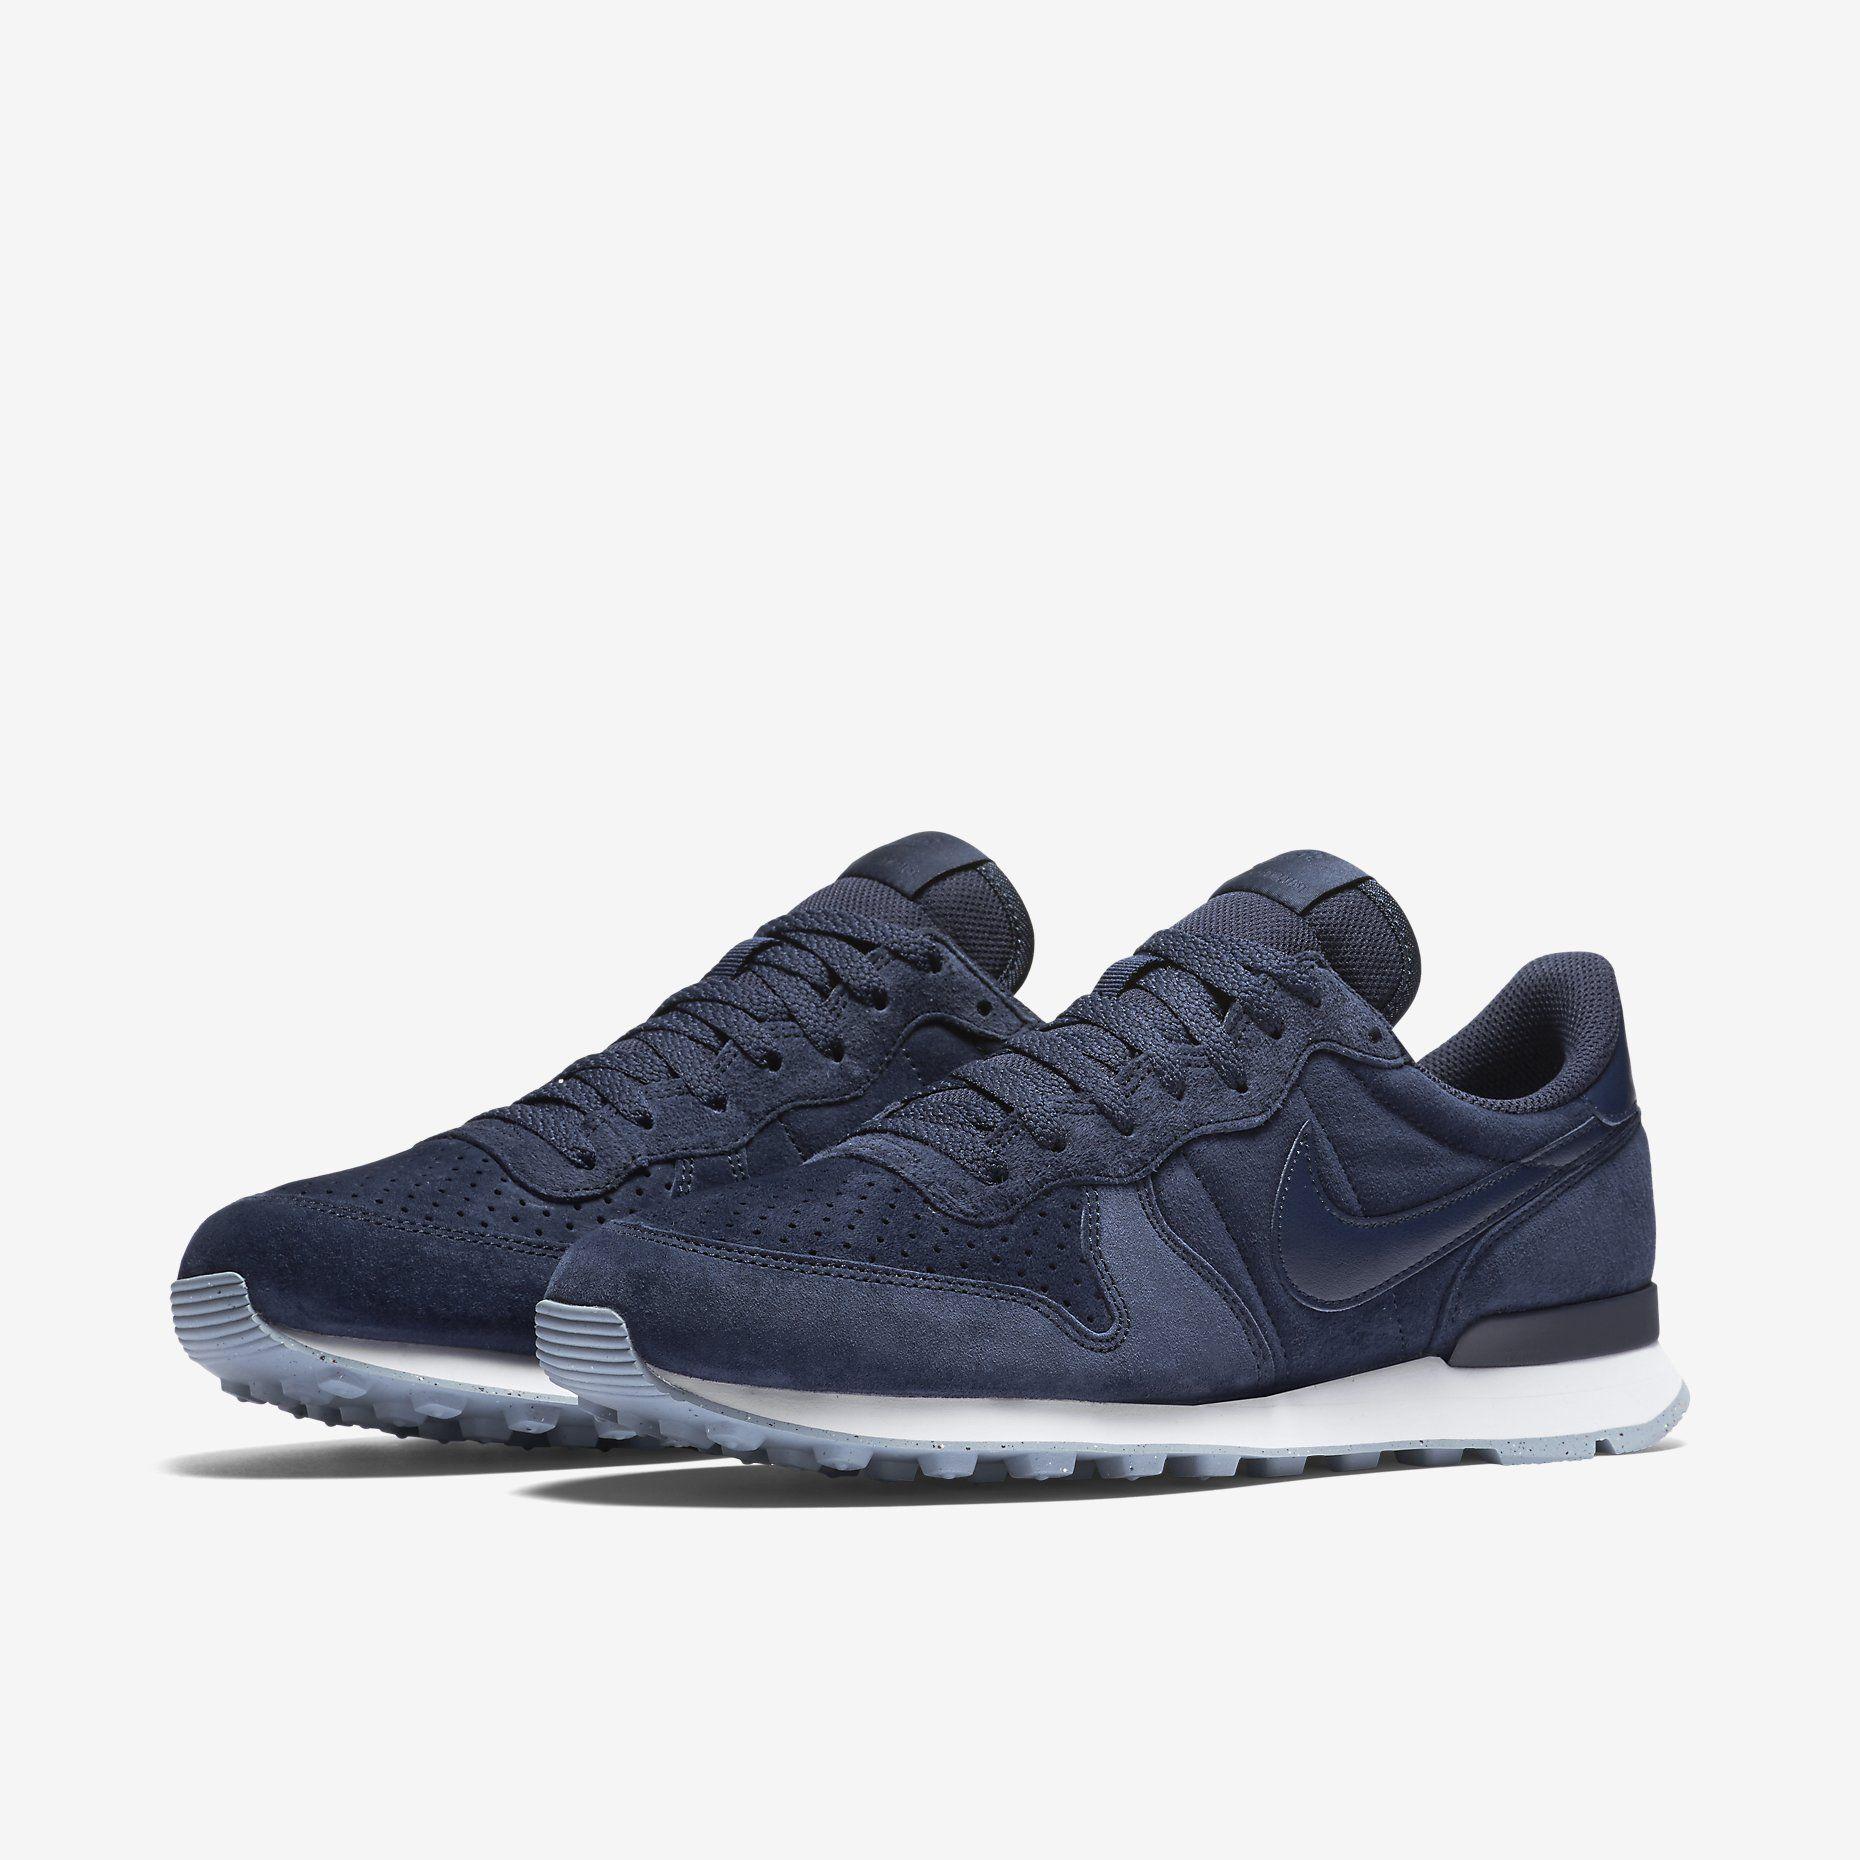 Nike Internationalist Premium (Obsidian/White/Obsidian)